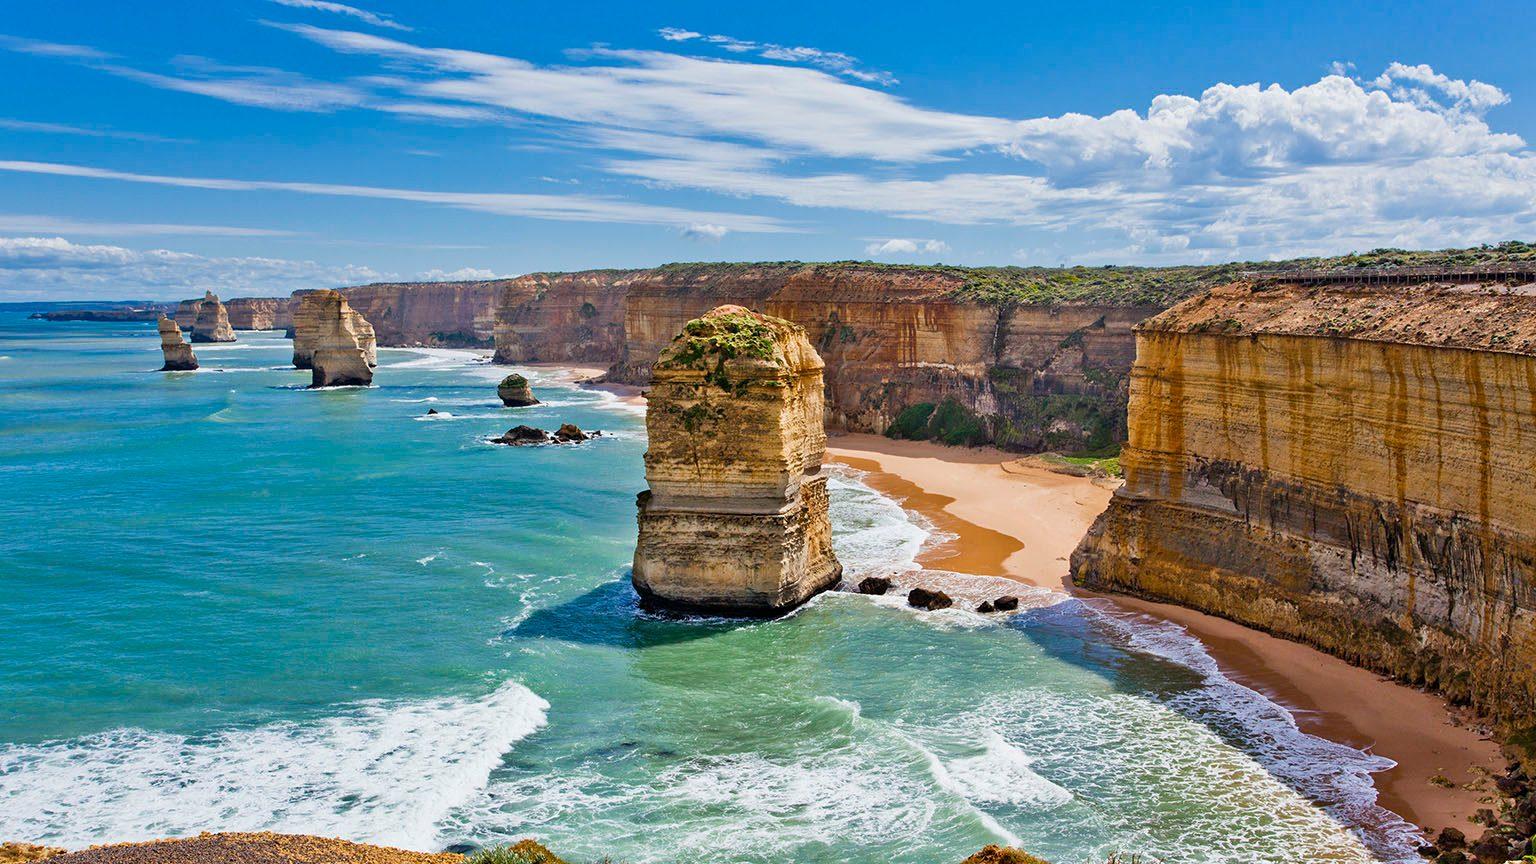 Australia, Victoria, Port Campbell National Park, Great Ocean Road, The Twelve Apostles.